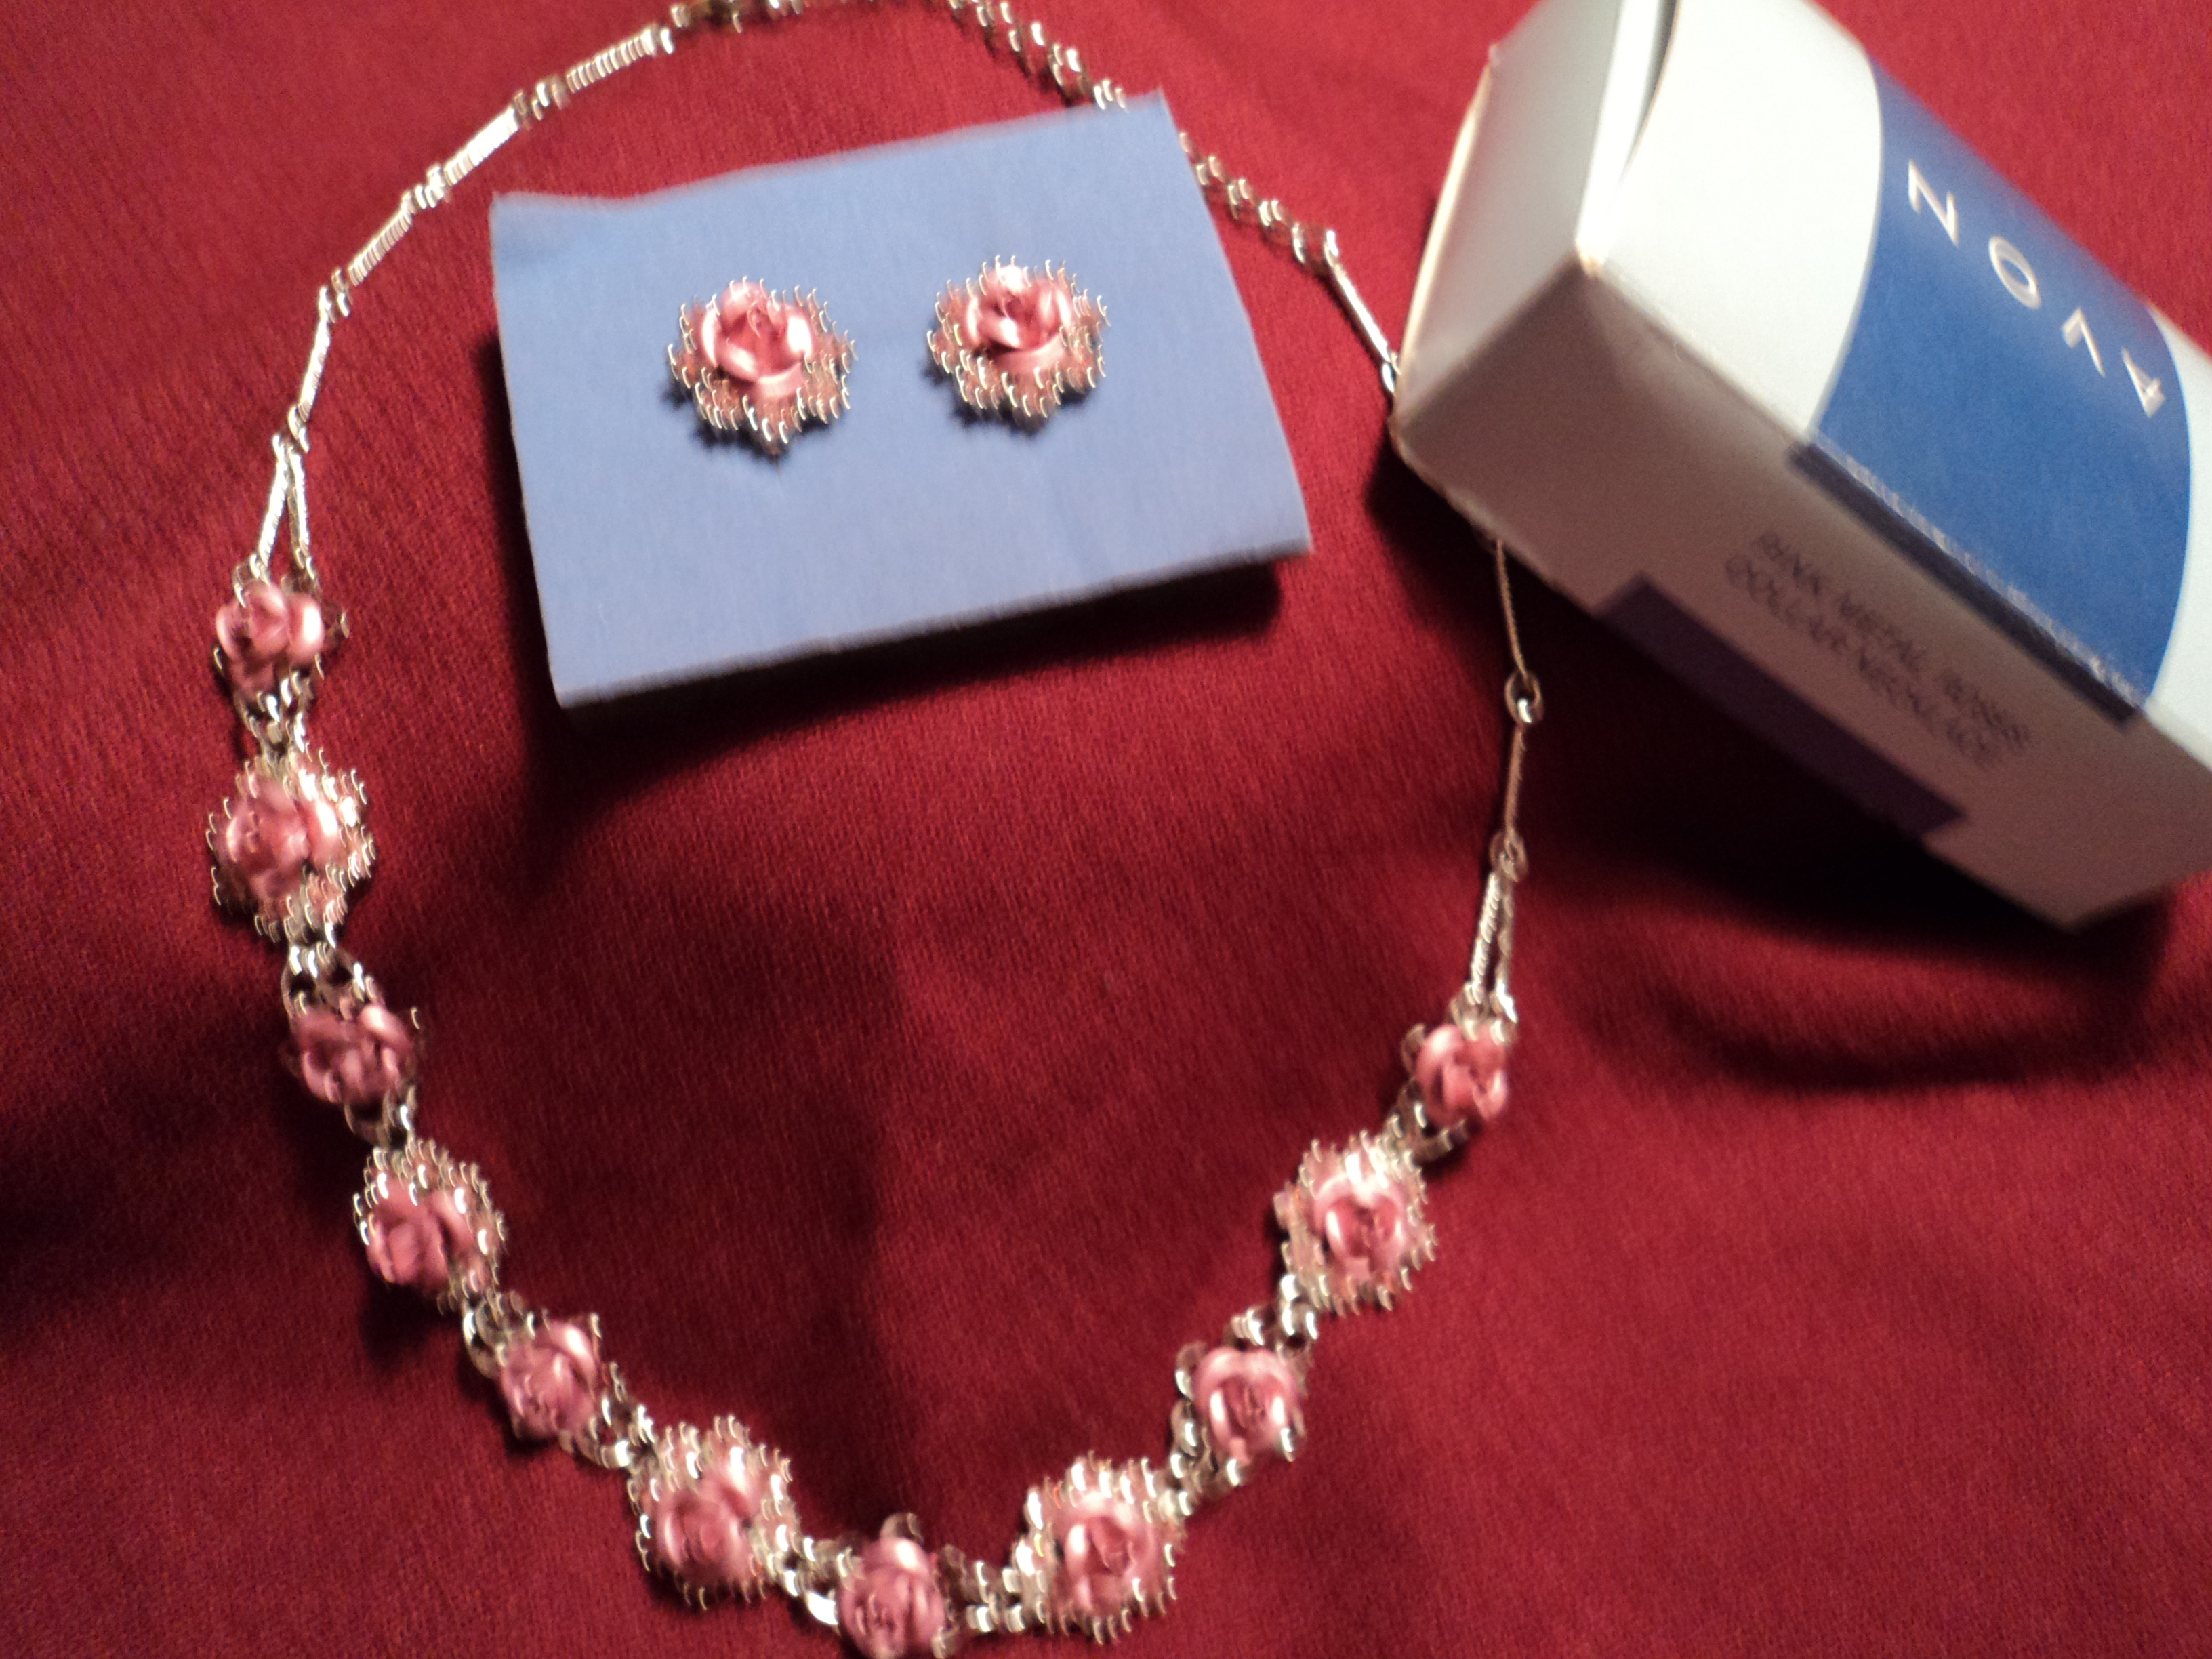 Avon Pink Metal Roses Collar Necklace And Pink Metal Roses